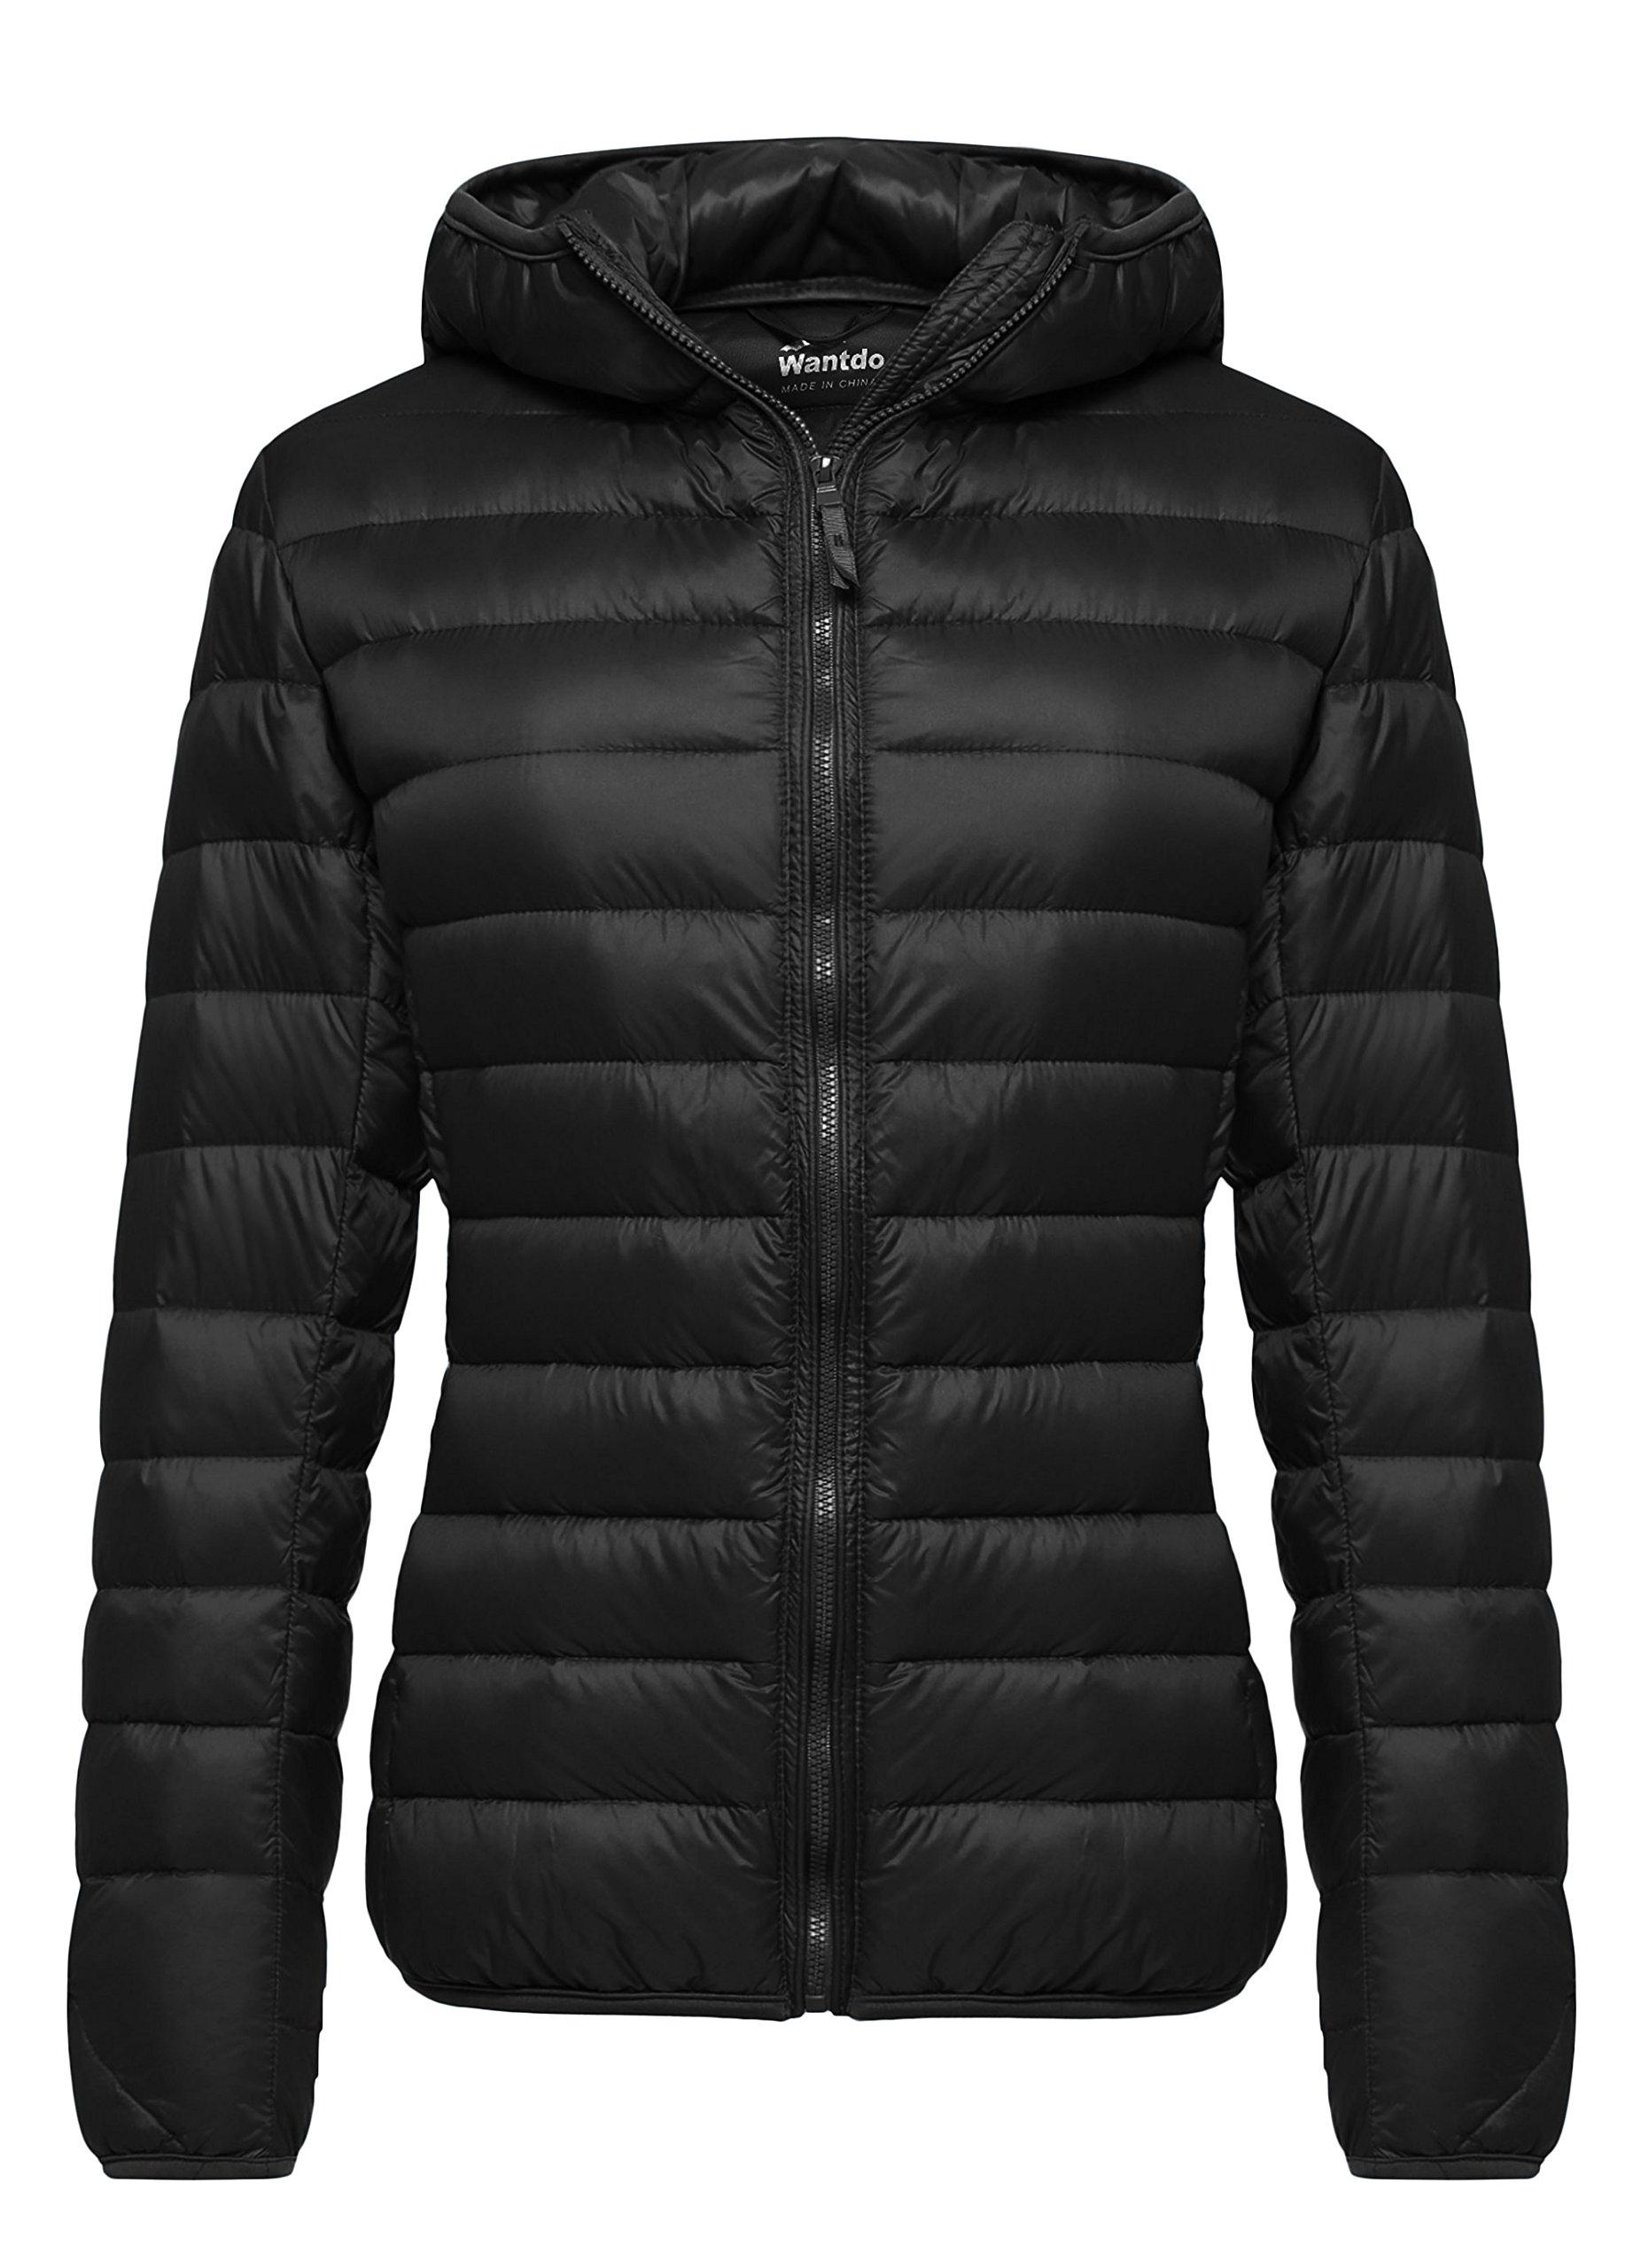 Wantdo Women's Hooded Packable Ultra Light Weight Down Coat Short Outwear(Black,US Medium) by Wantdo